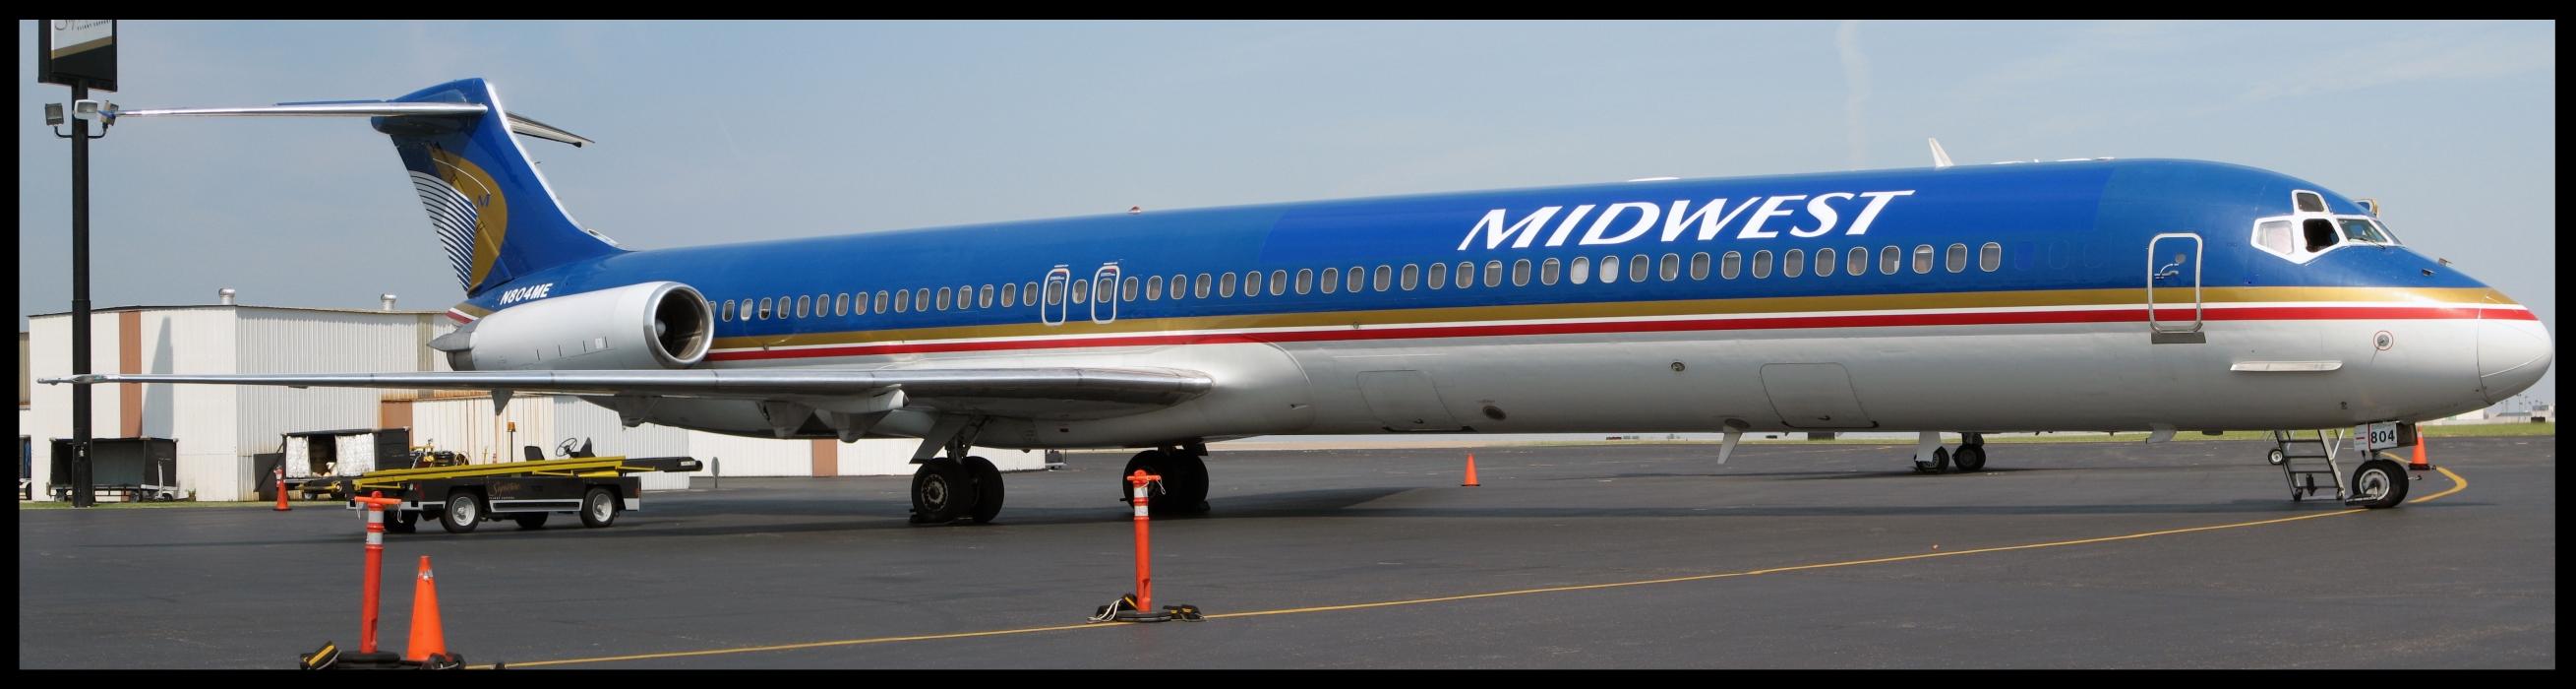 Airplane Spotting Assignment Nashville International Airport KBNA Part 2